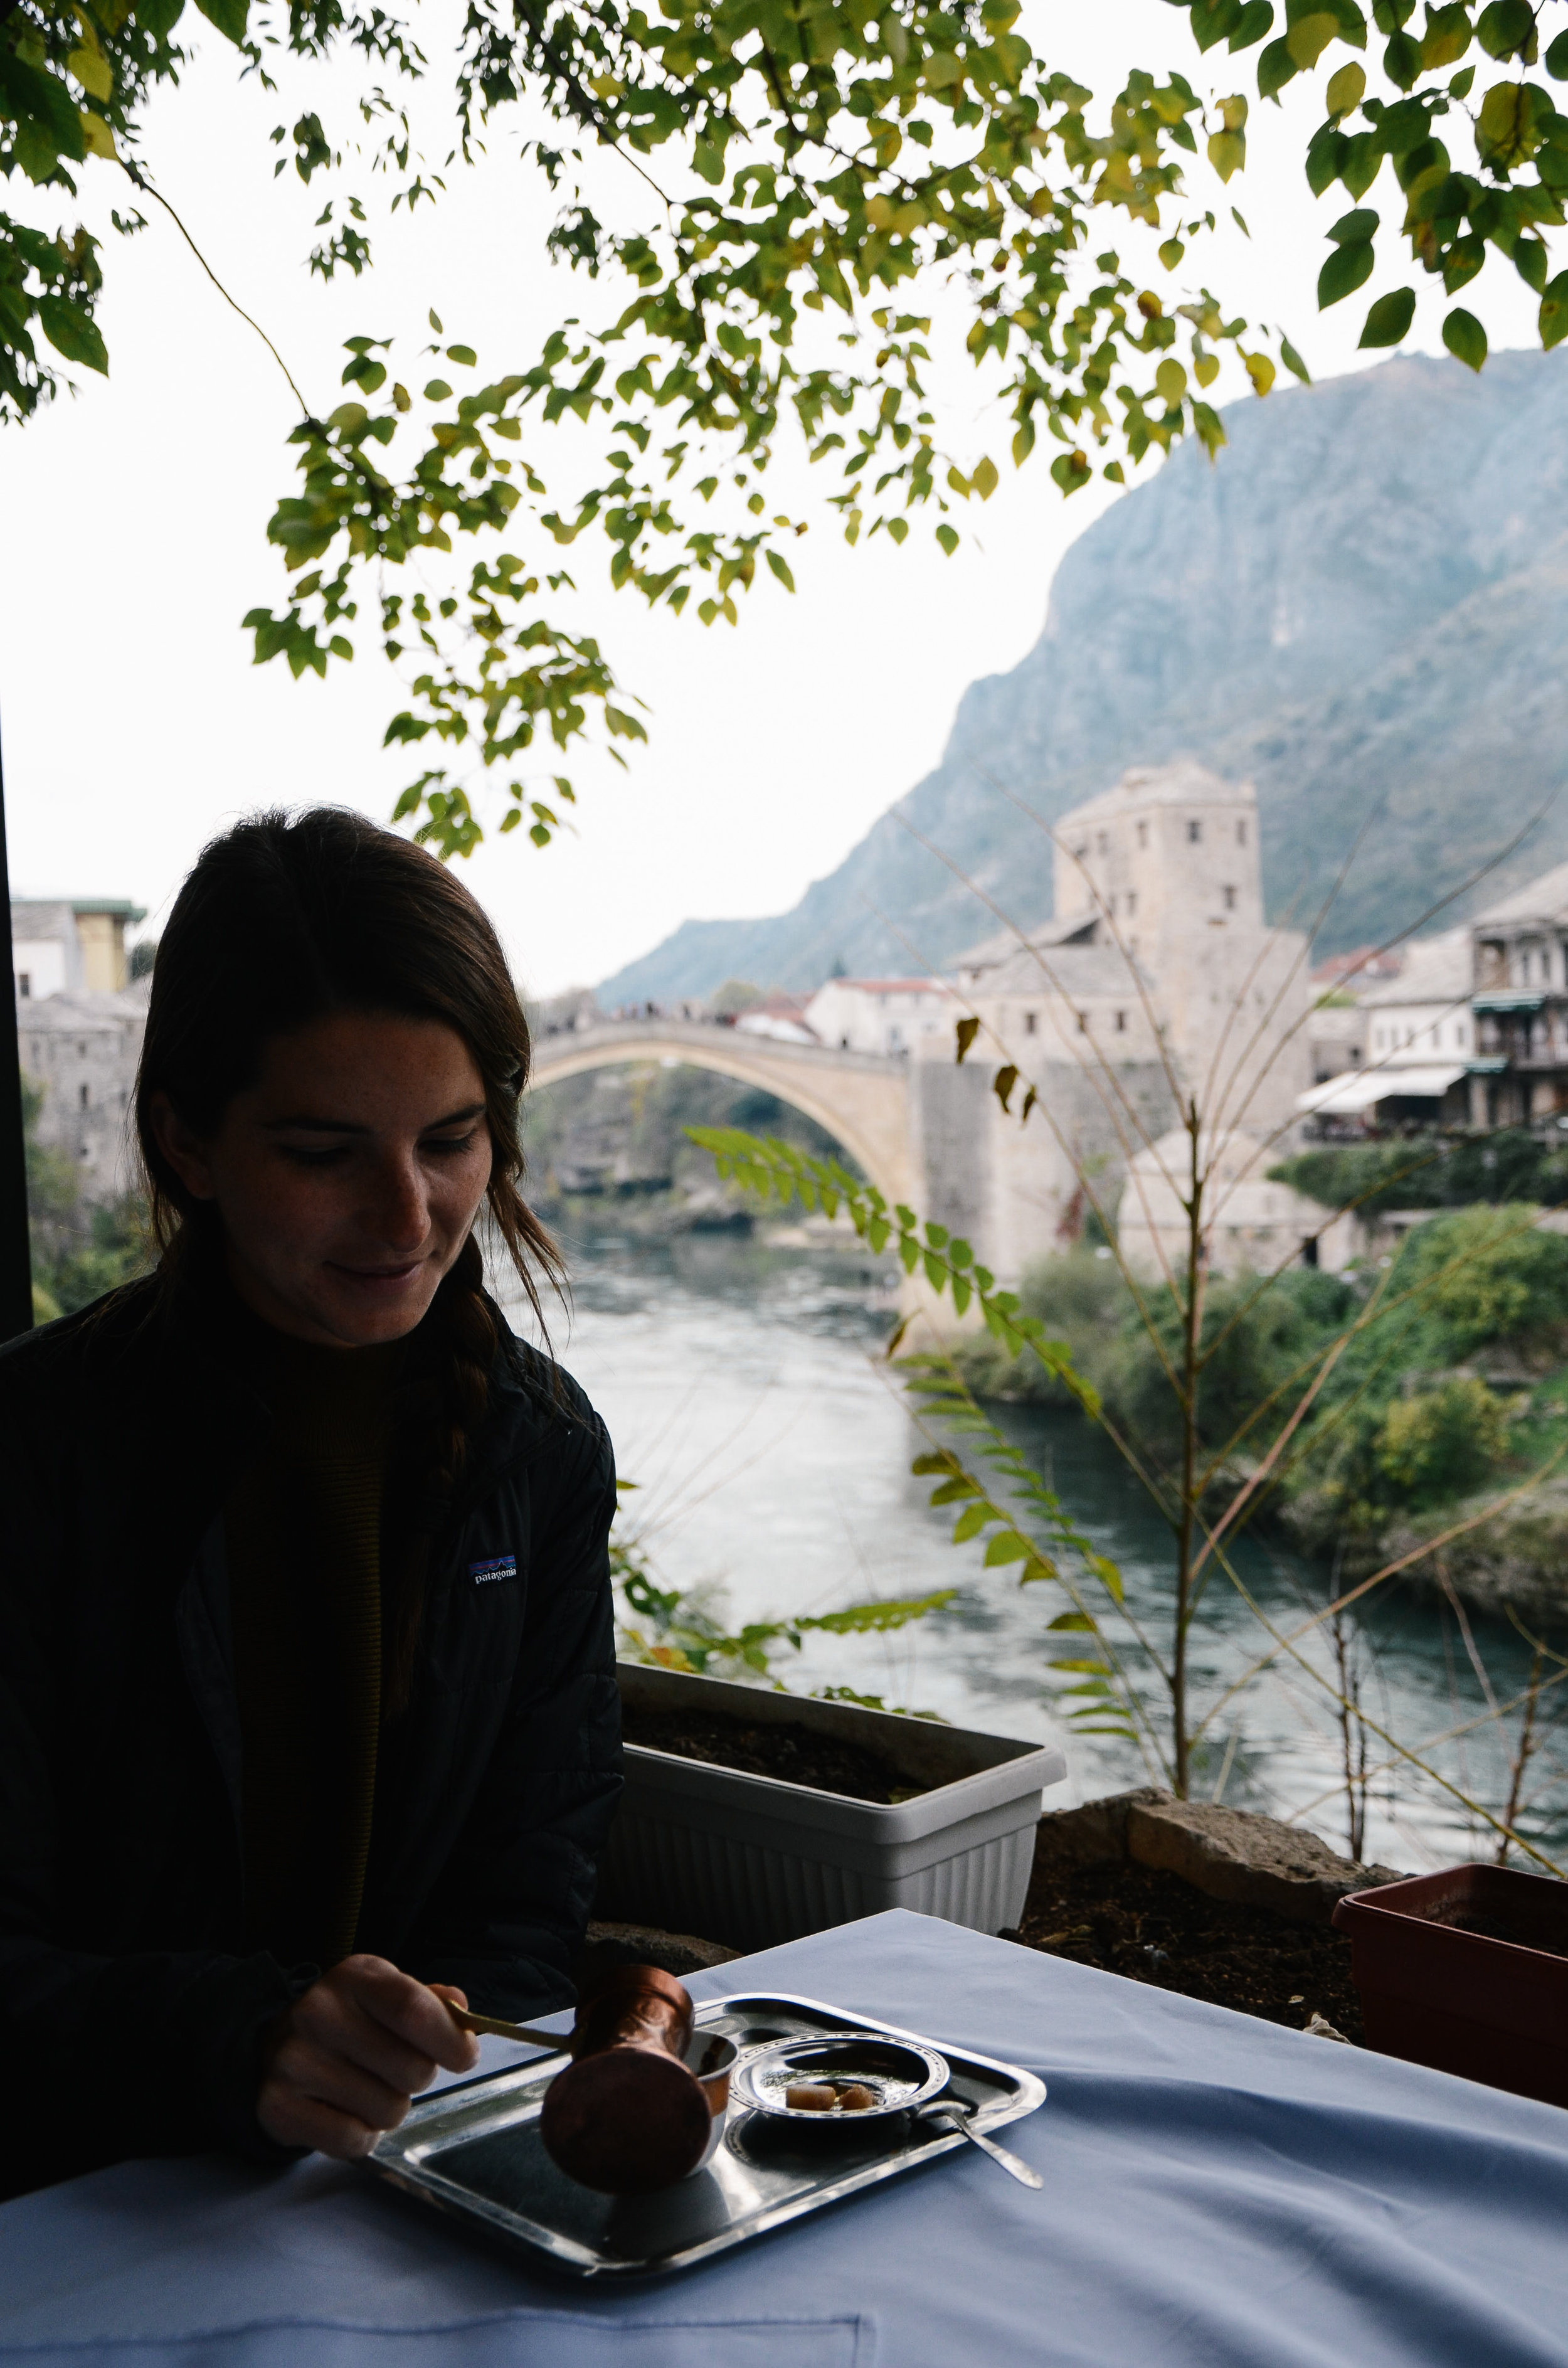 mostar-bosnia-travel-guide-lifeonpine_DSC_3244.jpg